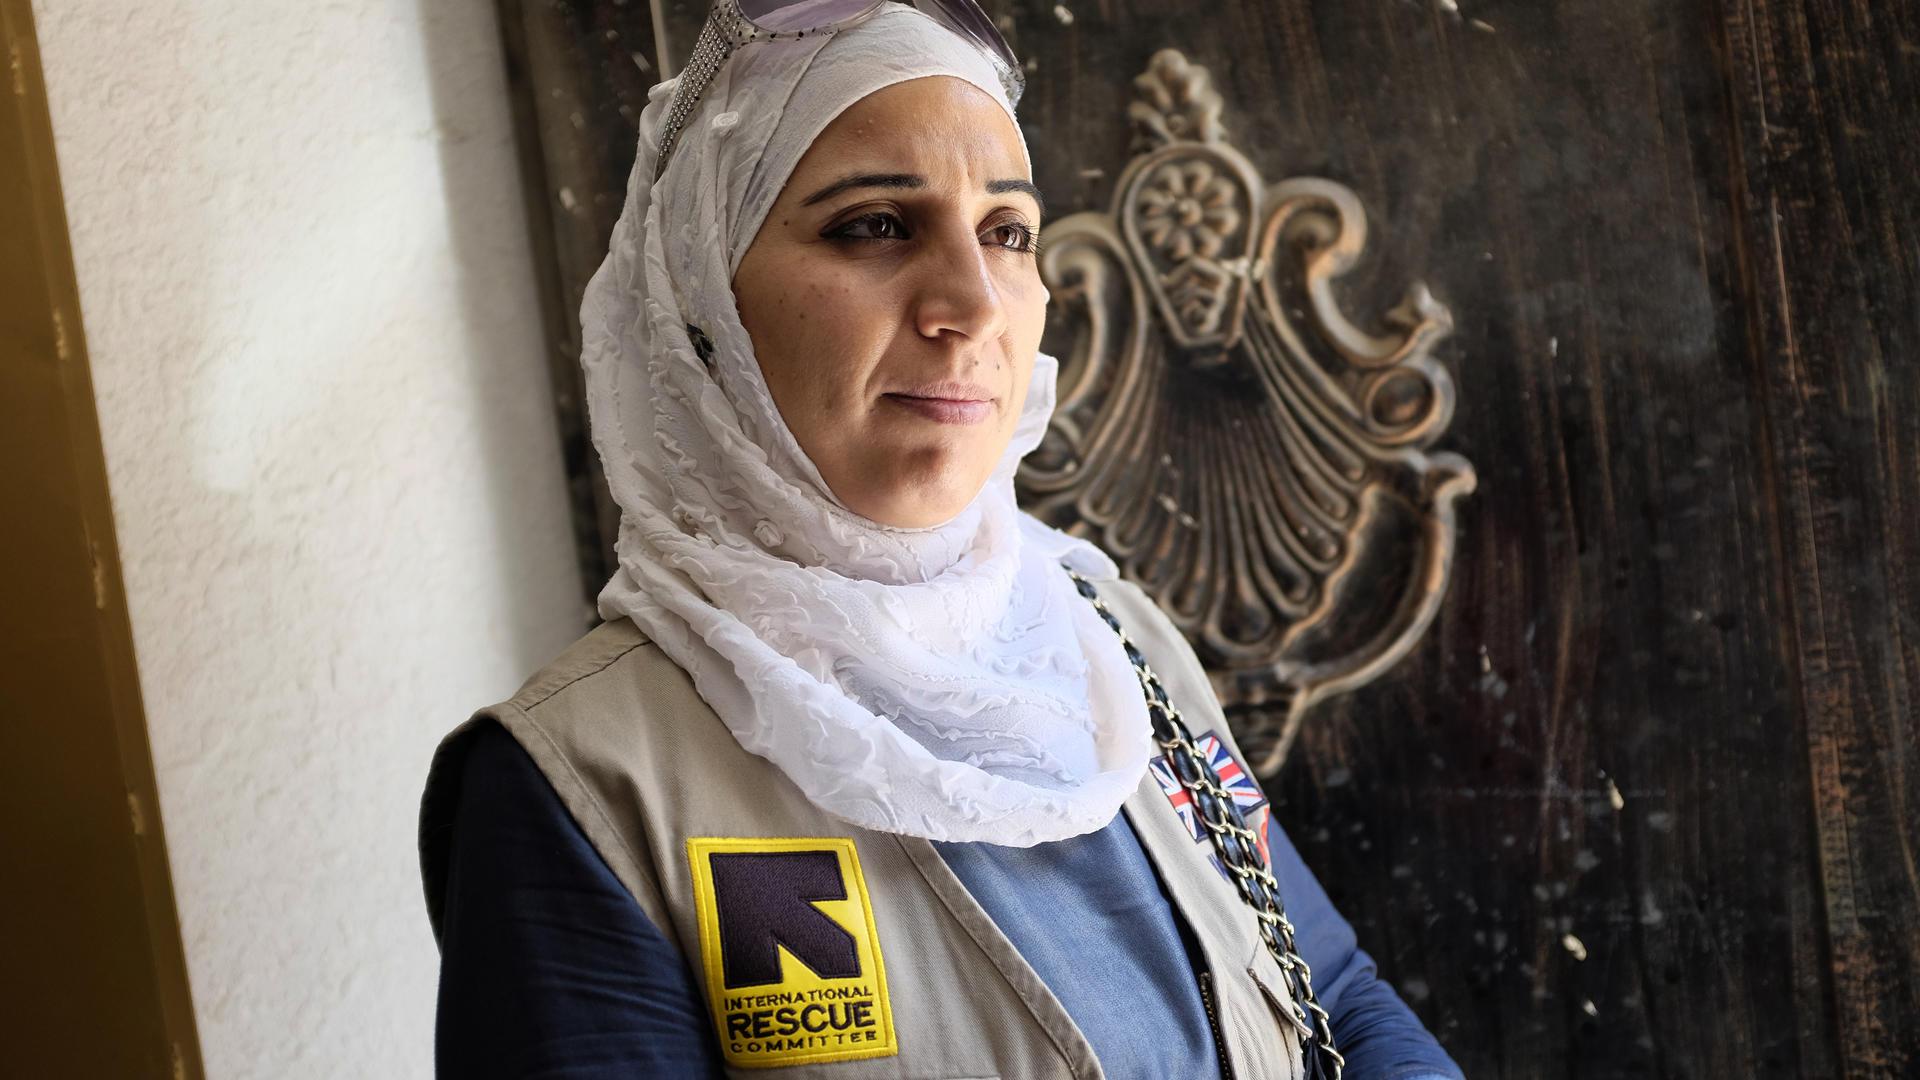 37-year-old Amira volunteers at a health clinic ru